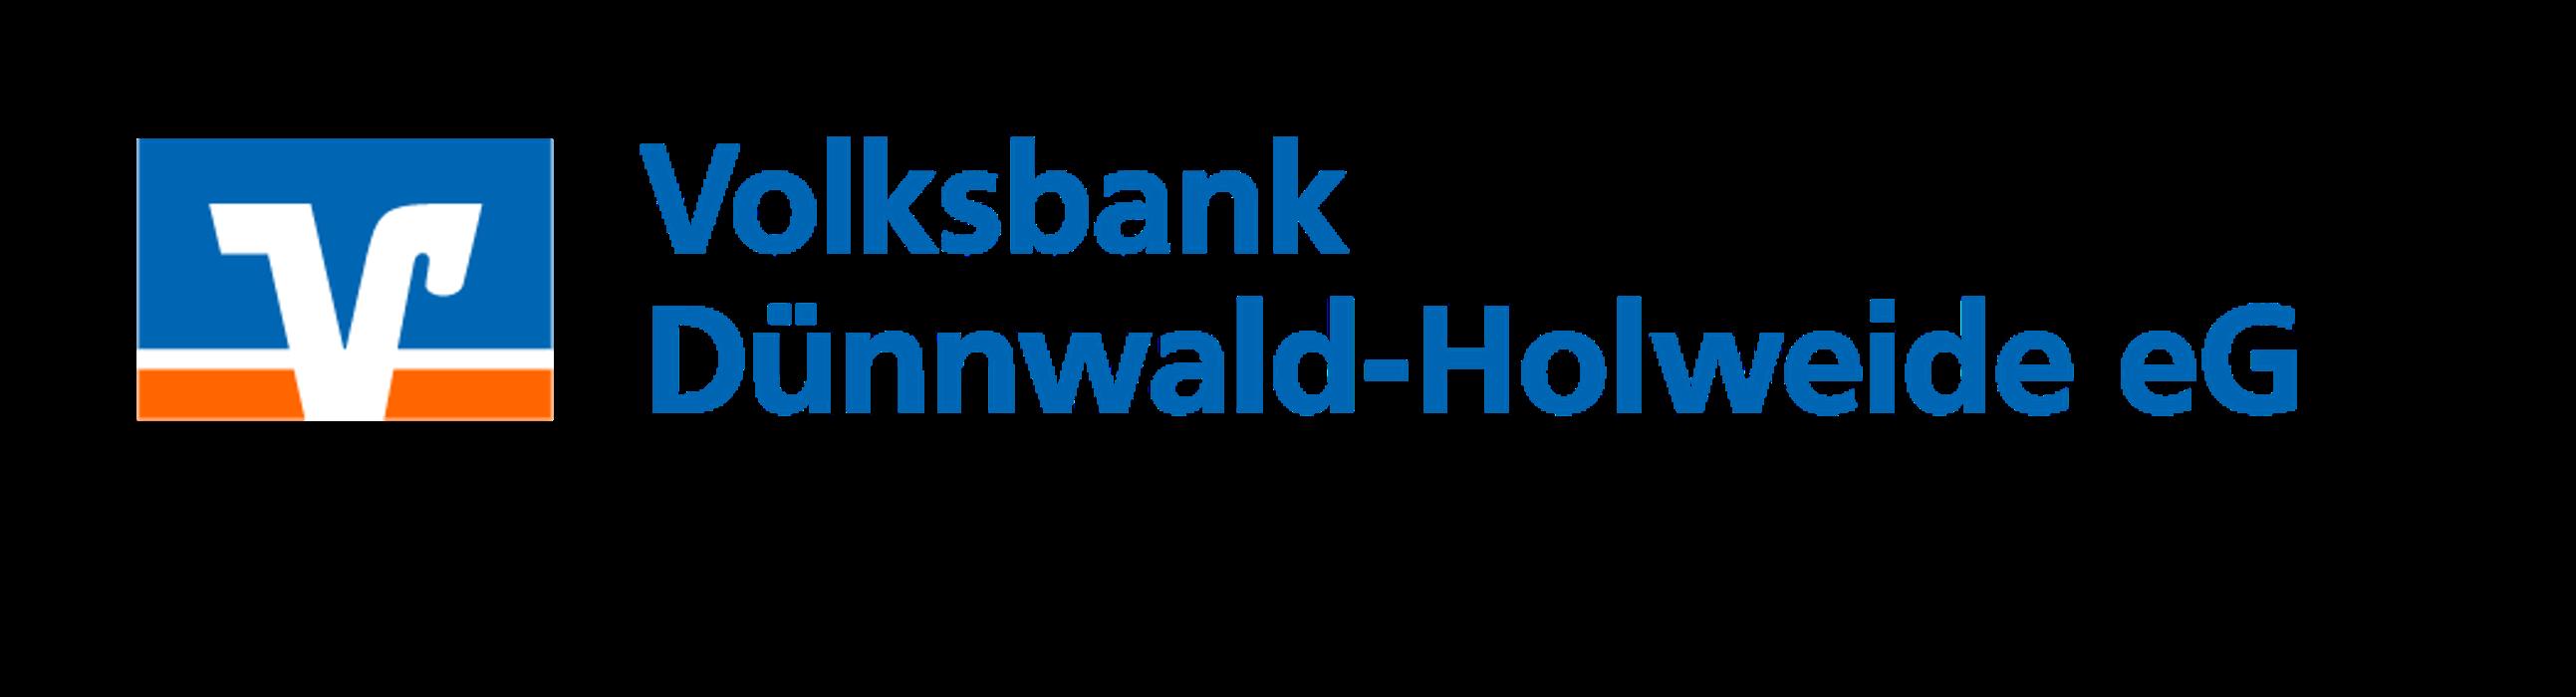 Volksbank Dünnwald-Holweide eG, Filiale Stammheim